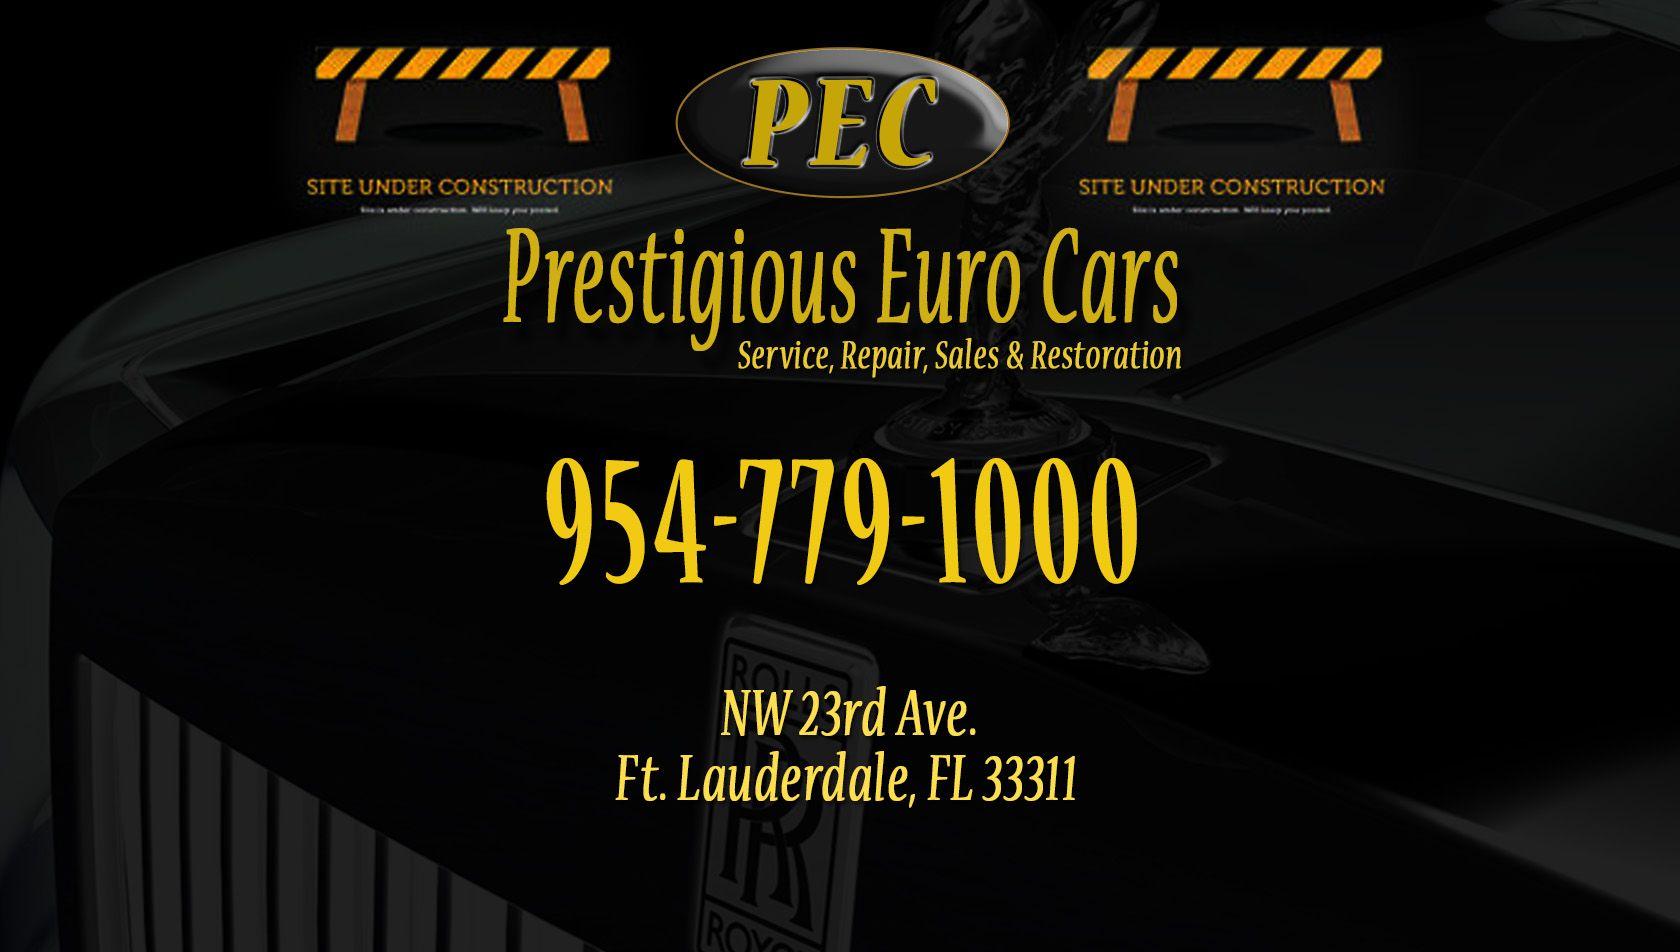 Professional Audi Repair And Service Prestigious Euro Cars Can Help